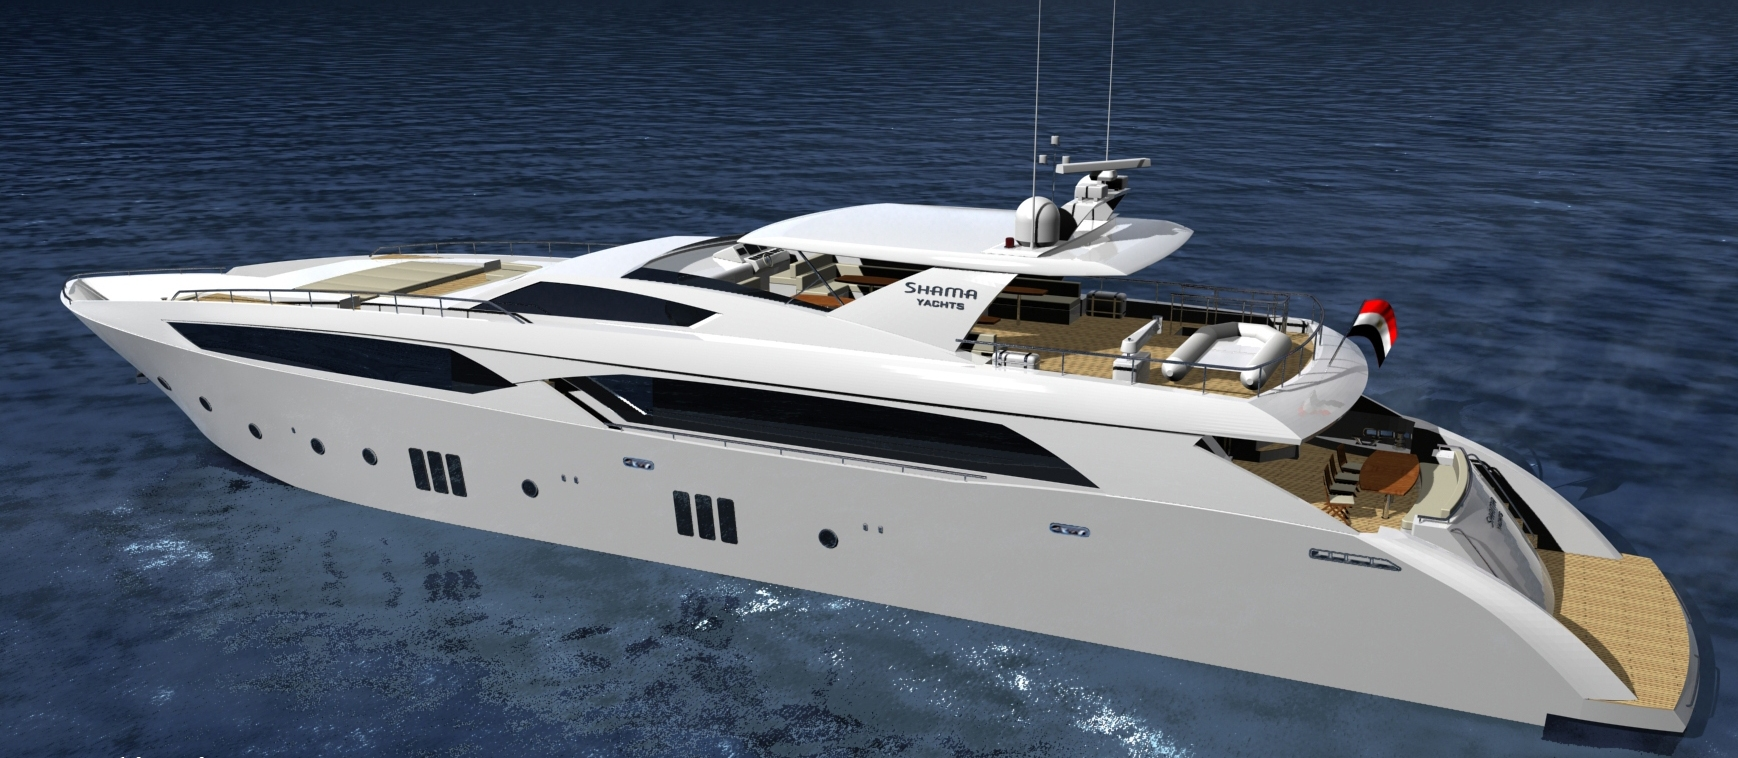 egypt yacht charter superyacht news. Black Bedroom Furniture Sets. Home Design Ideas